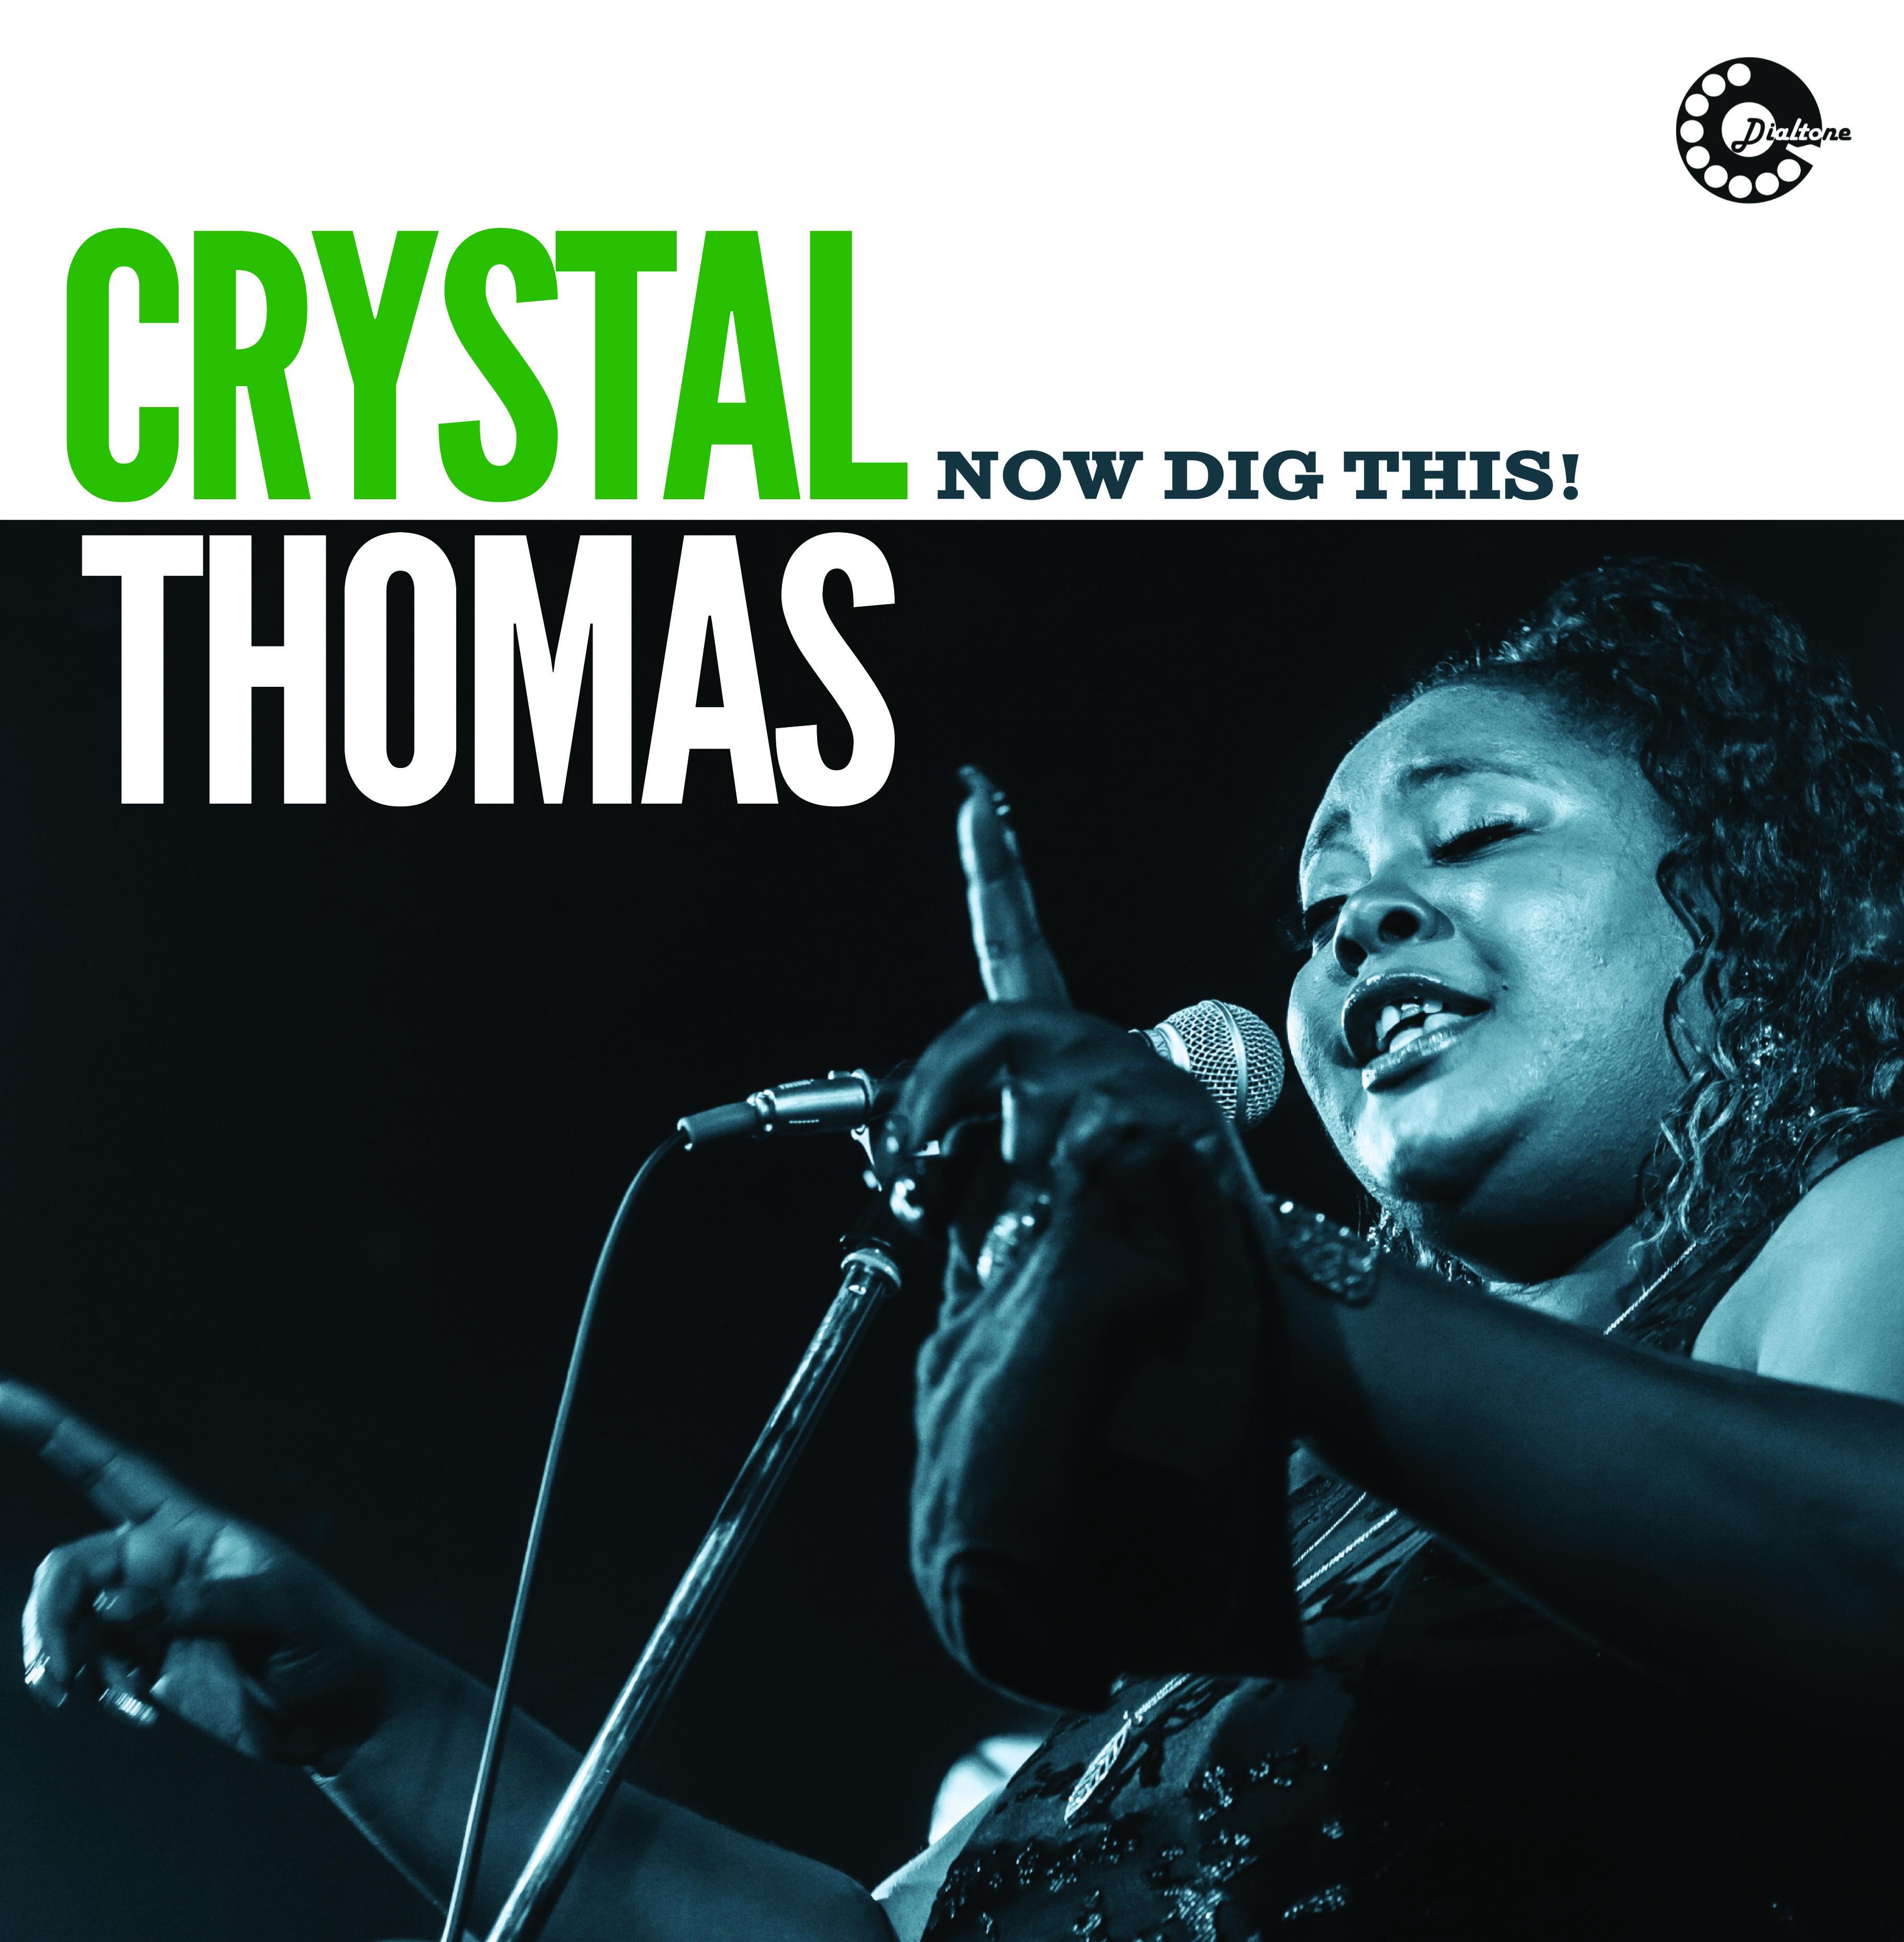 Crystal Thomas Cover Image